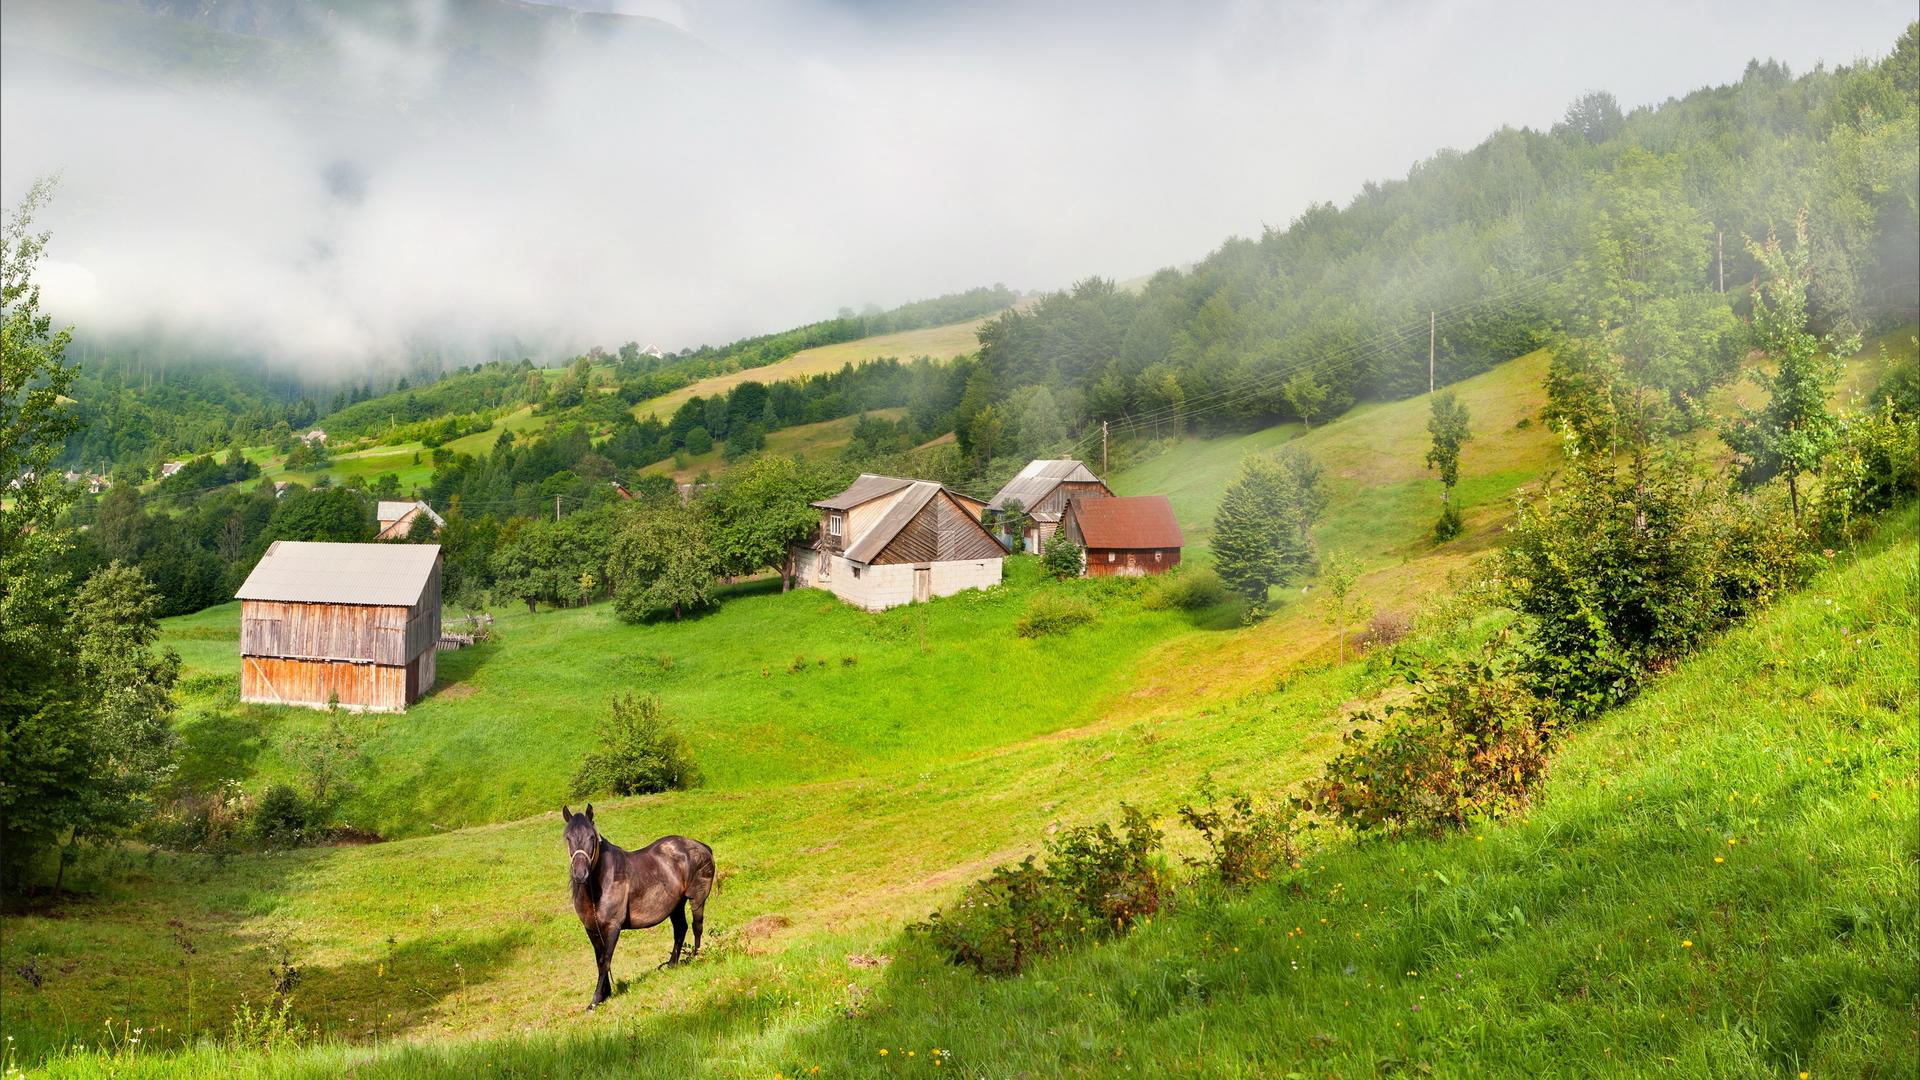 Картинка На Рабочий Стол Деревня Летом